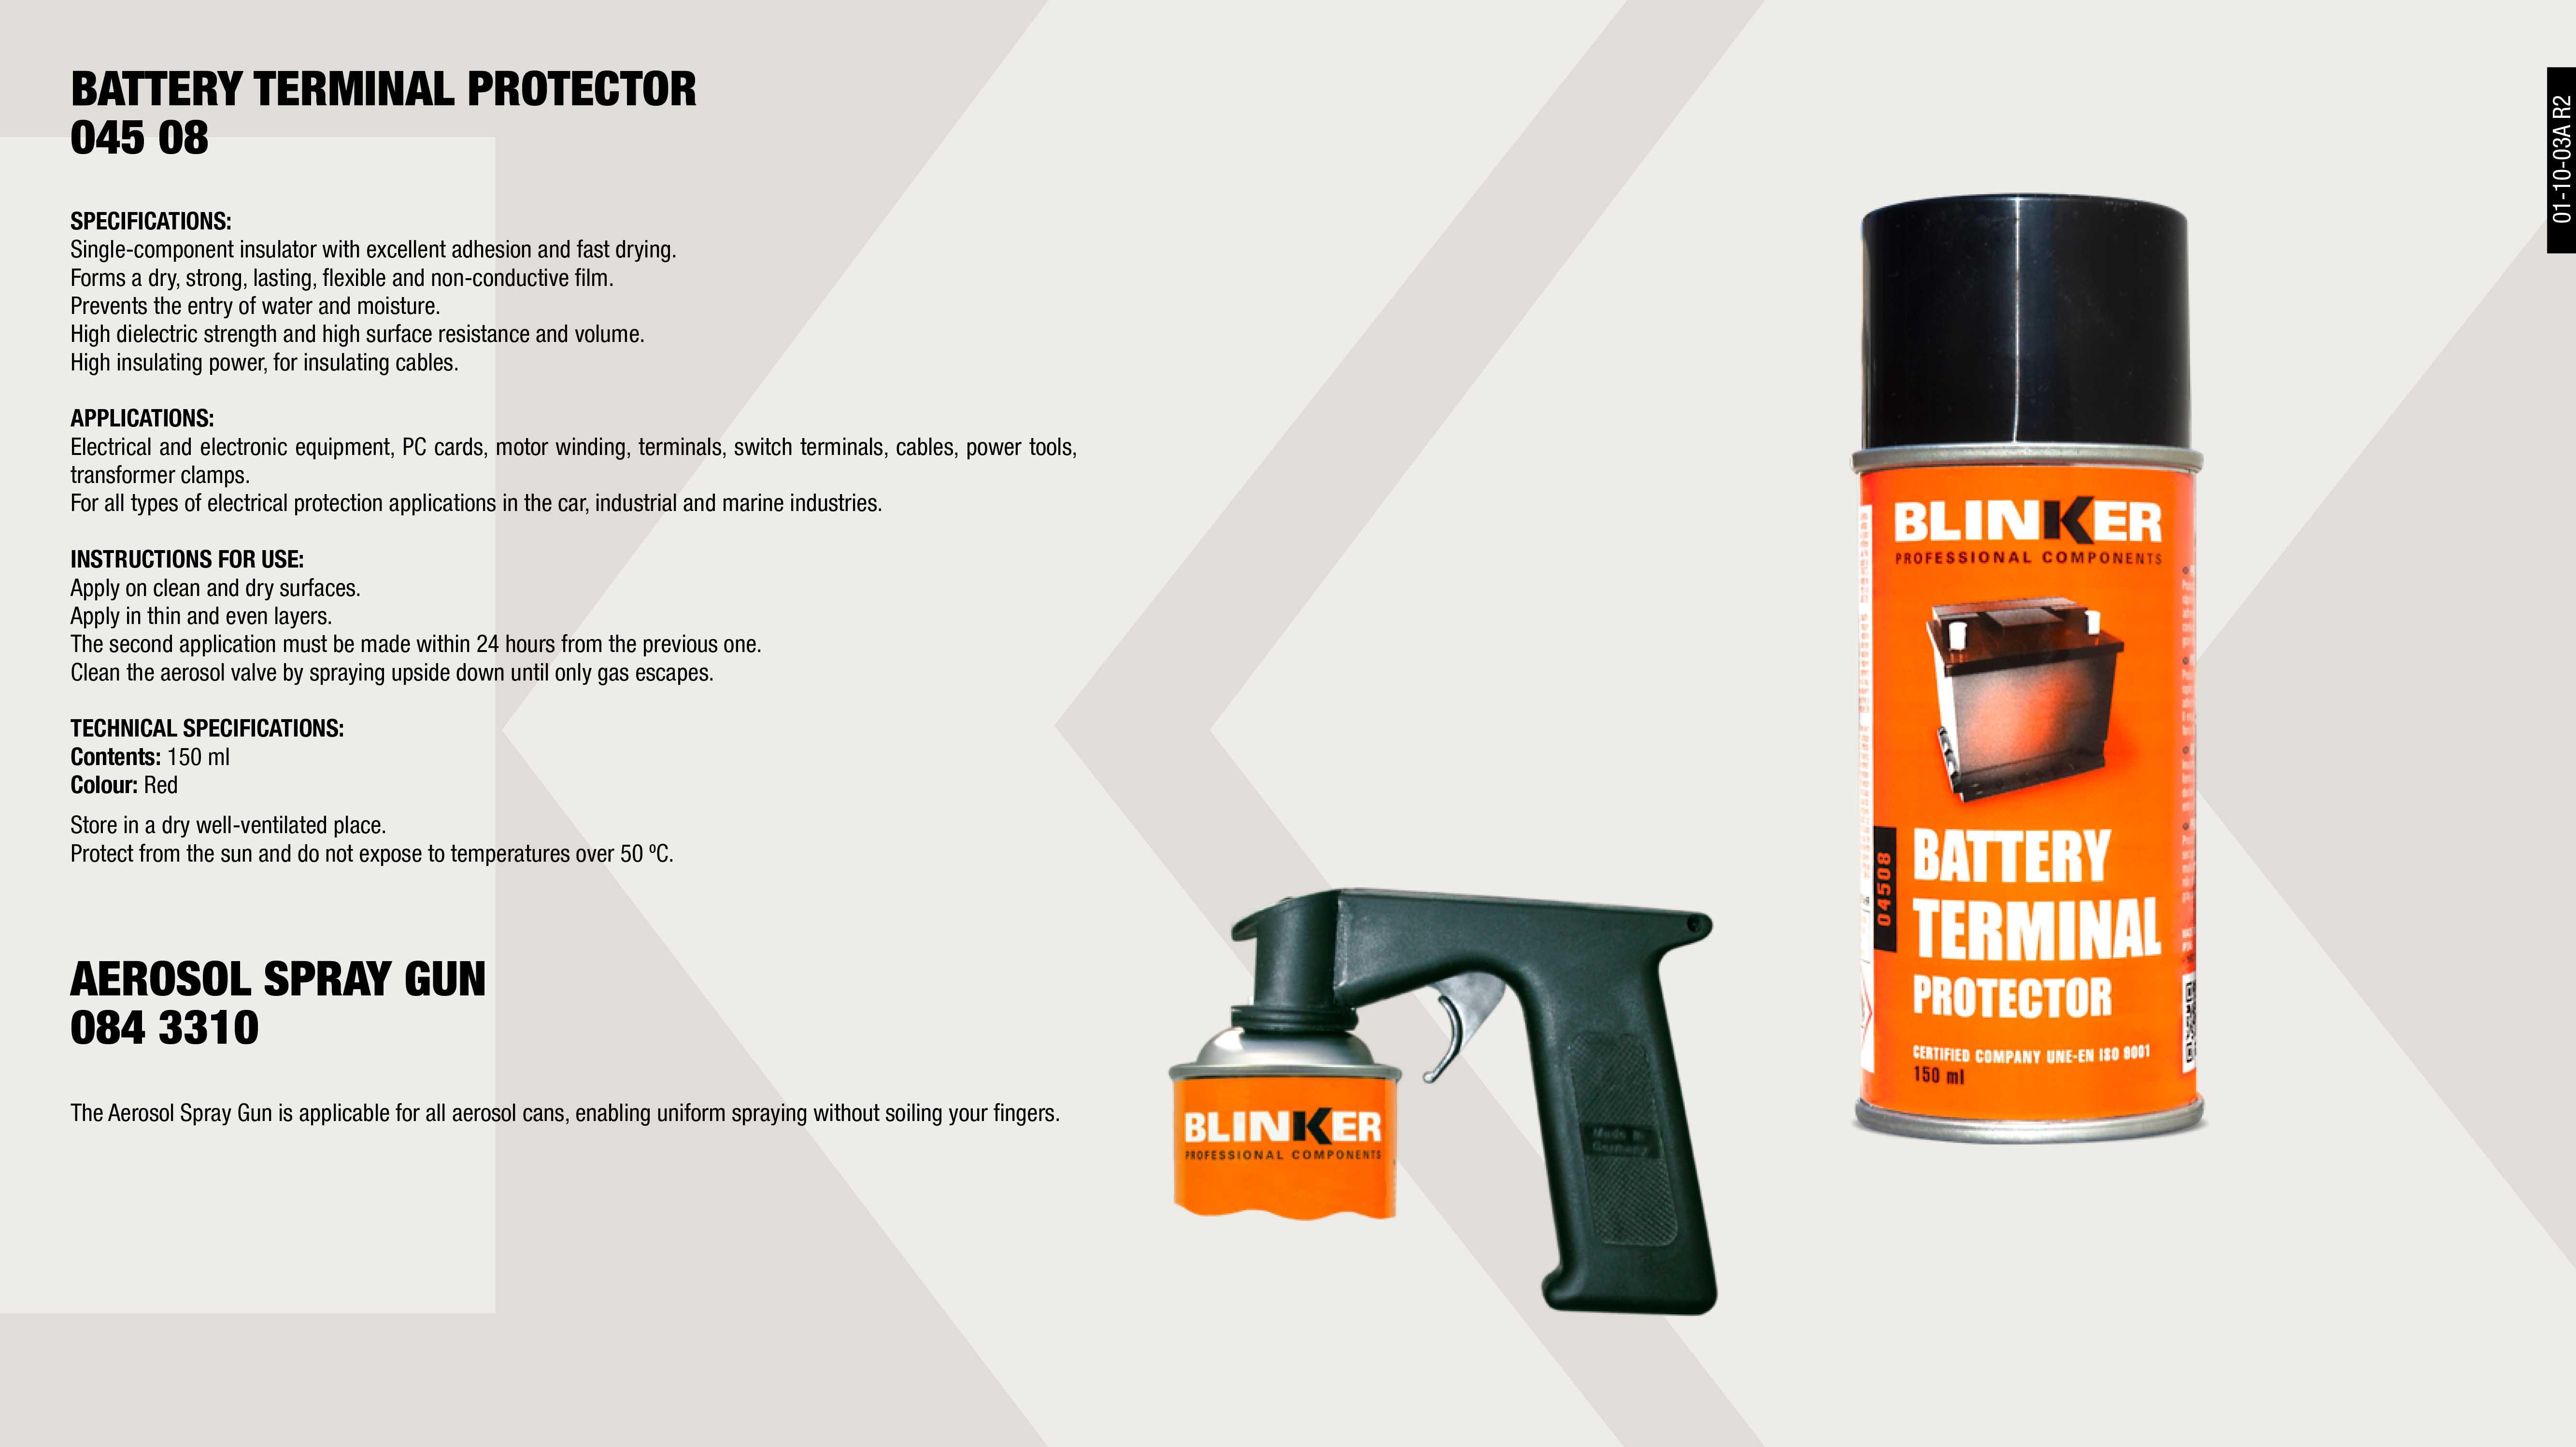 BATERY TERMINALS PROTECTIVE SPRAY BLINKER 150 ML            ,  SPRAY AEROSOL GUN                                           ,